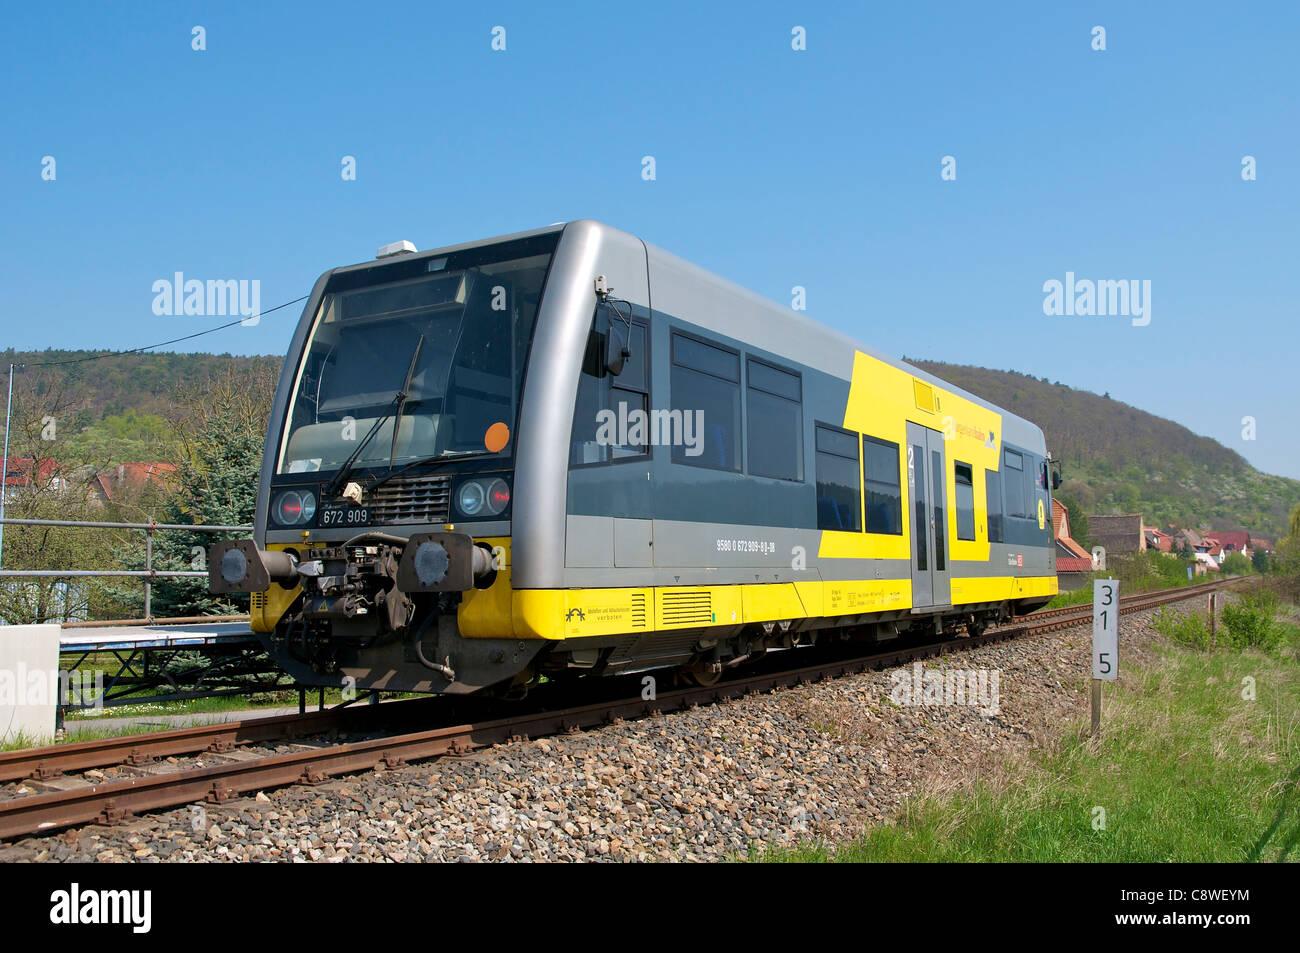 Small train called 'Burgenlandbahn' in the Unstrut valley in Wangen. - Stock Image